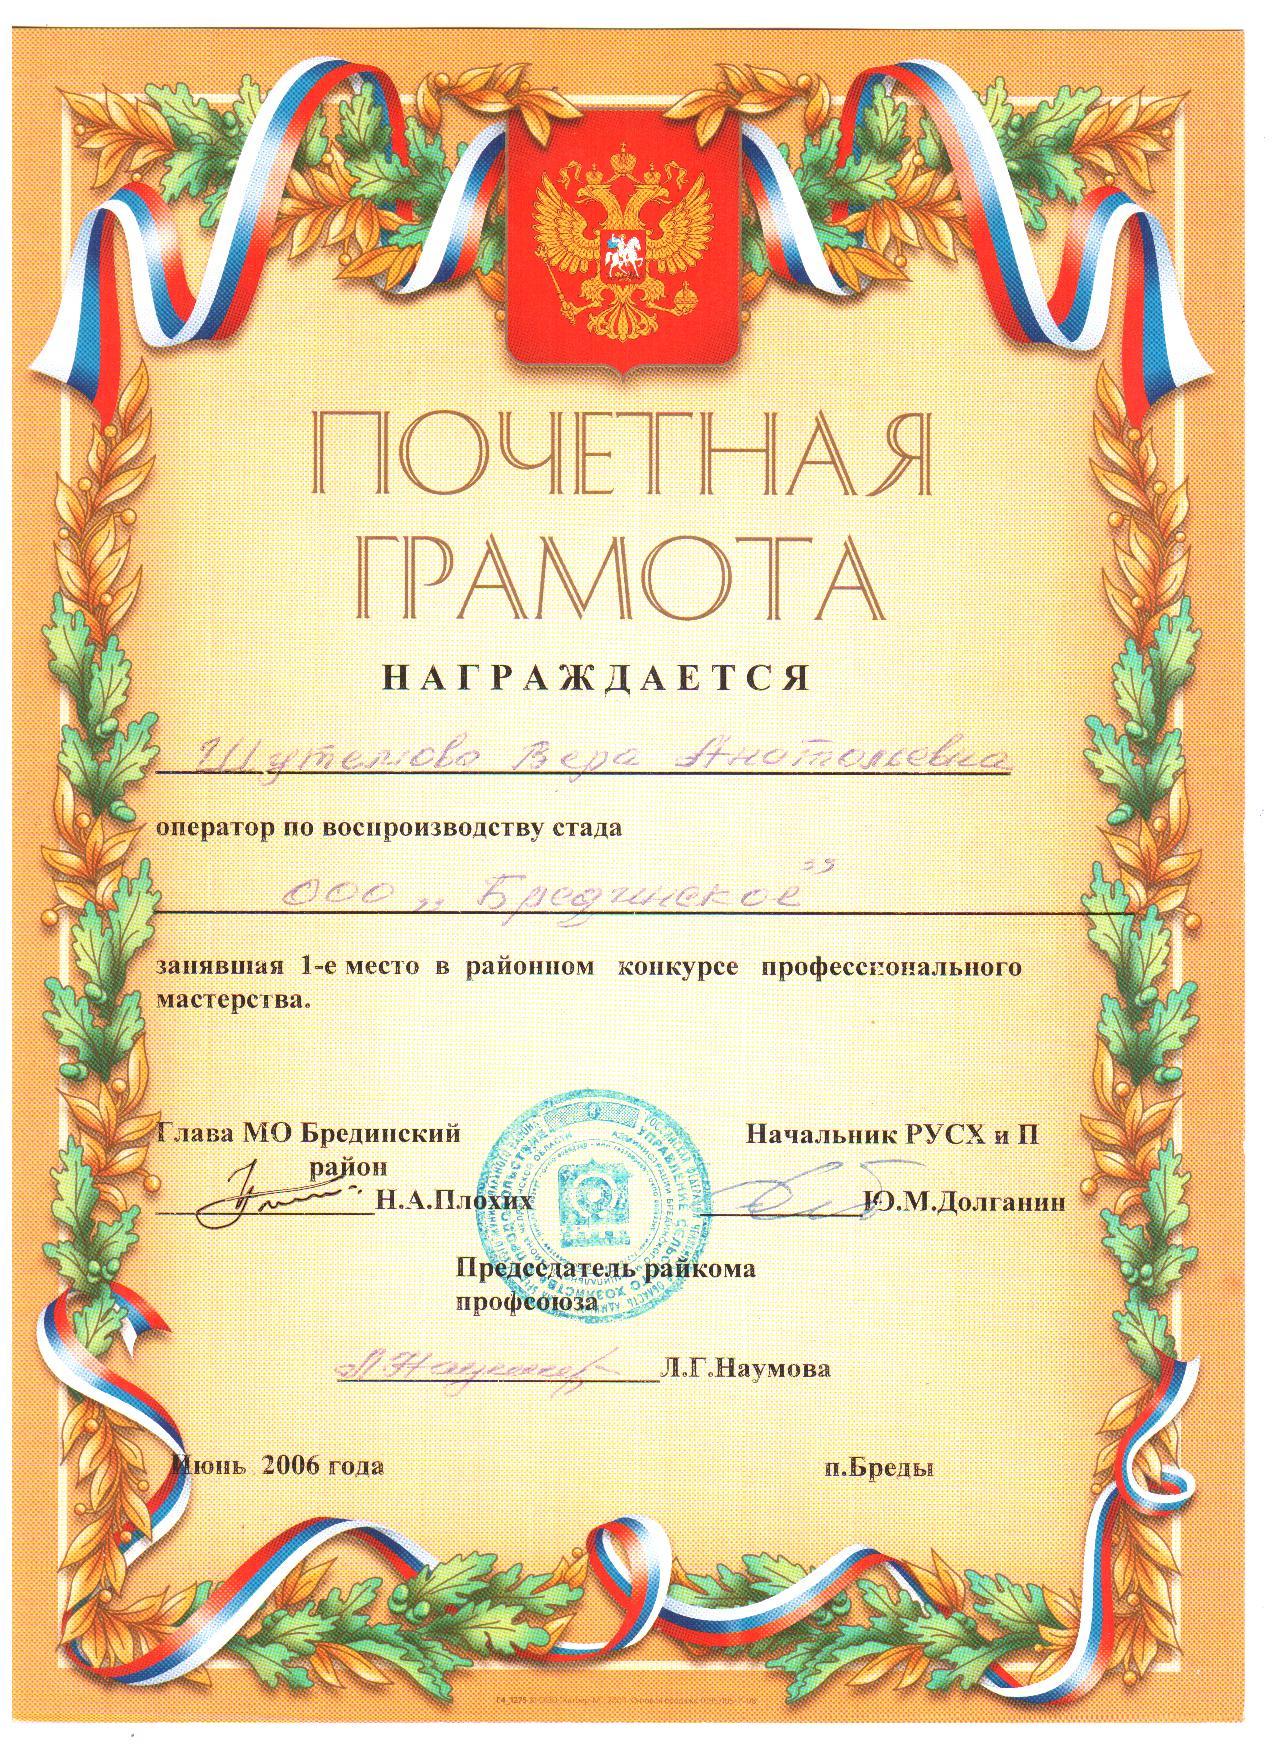 C:\Documents and Settings\Администратор\Рабочий стол\Шутёмова приложение\Изображение 011.jpg